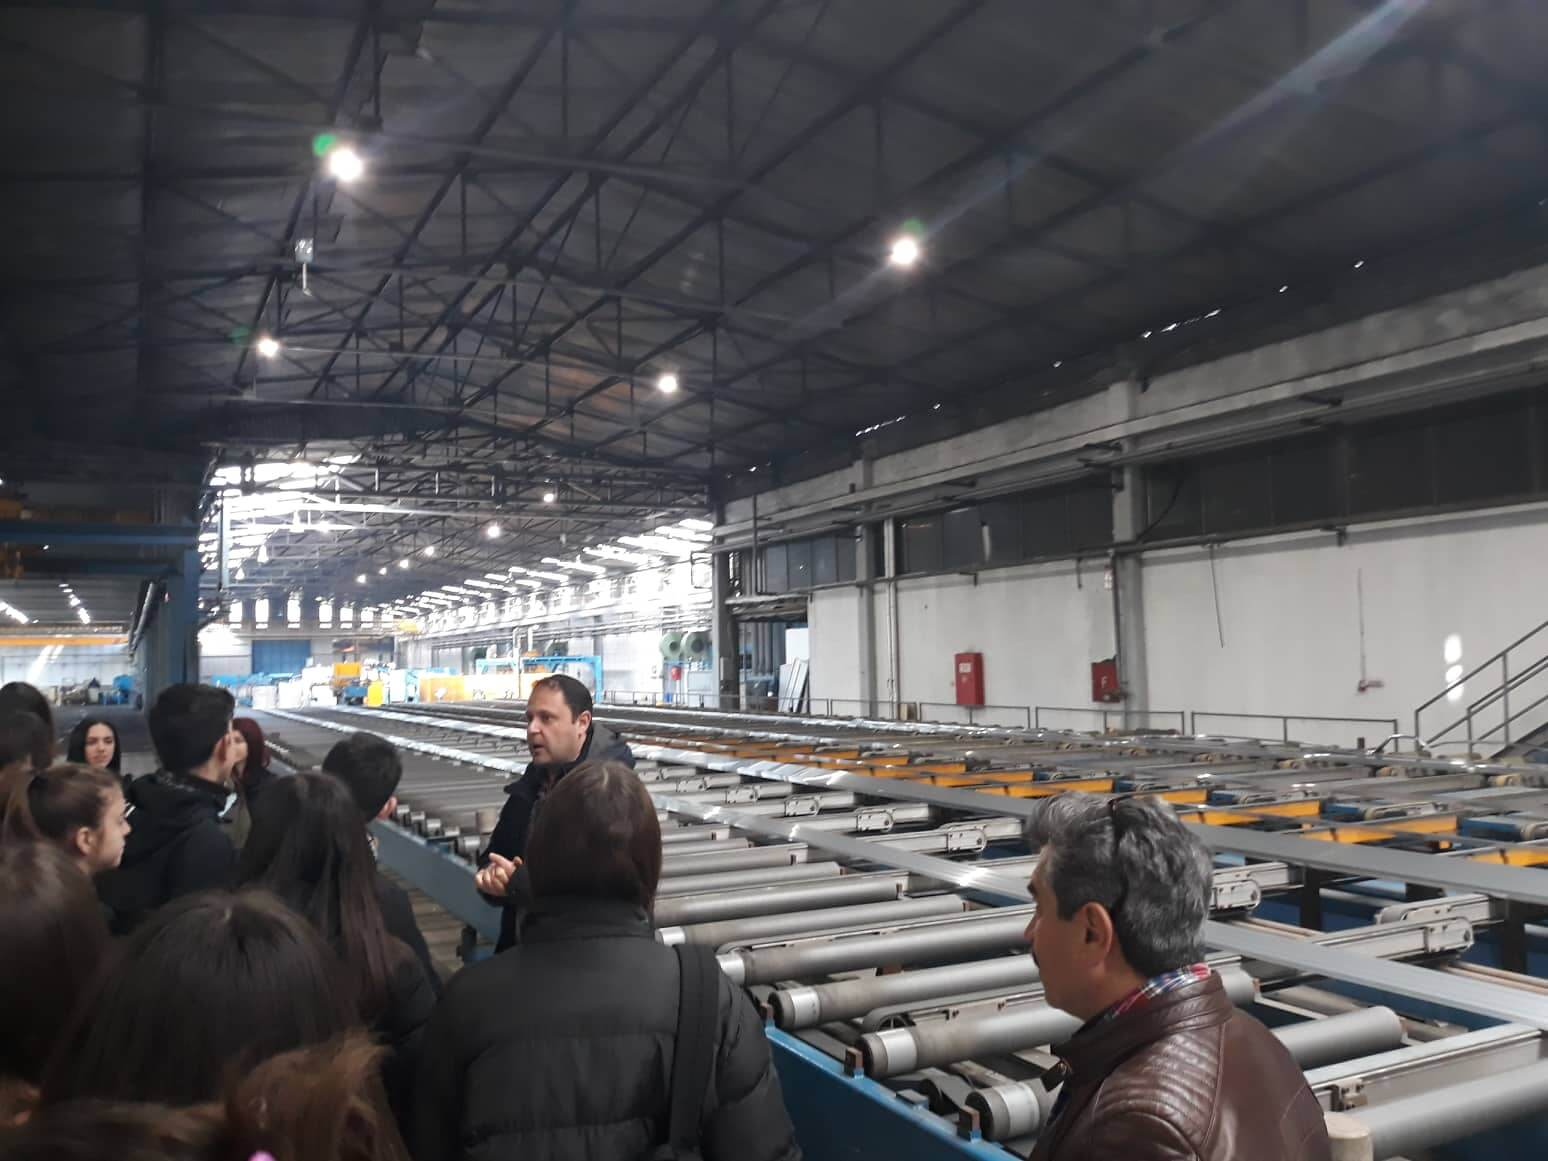 To Παραγωγικό Σκασιαρχείο επισκέπτεται την Alumil 3